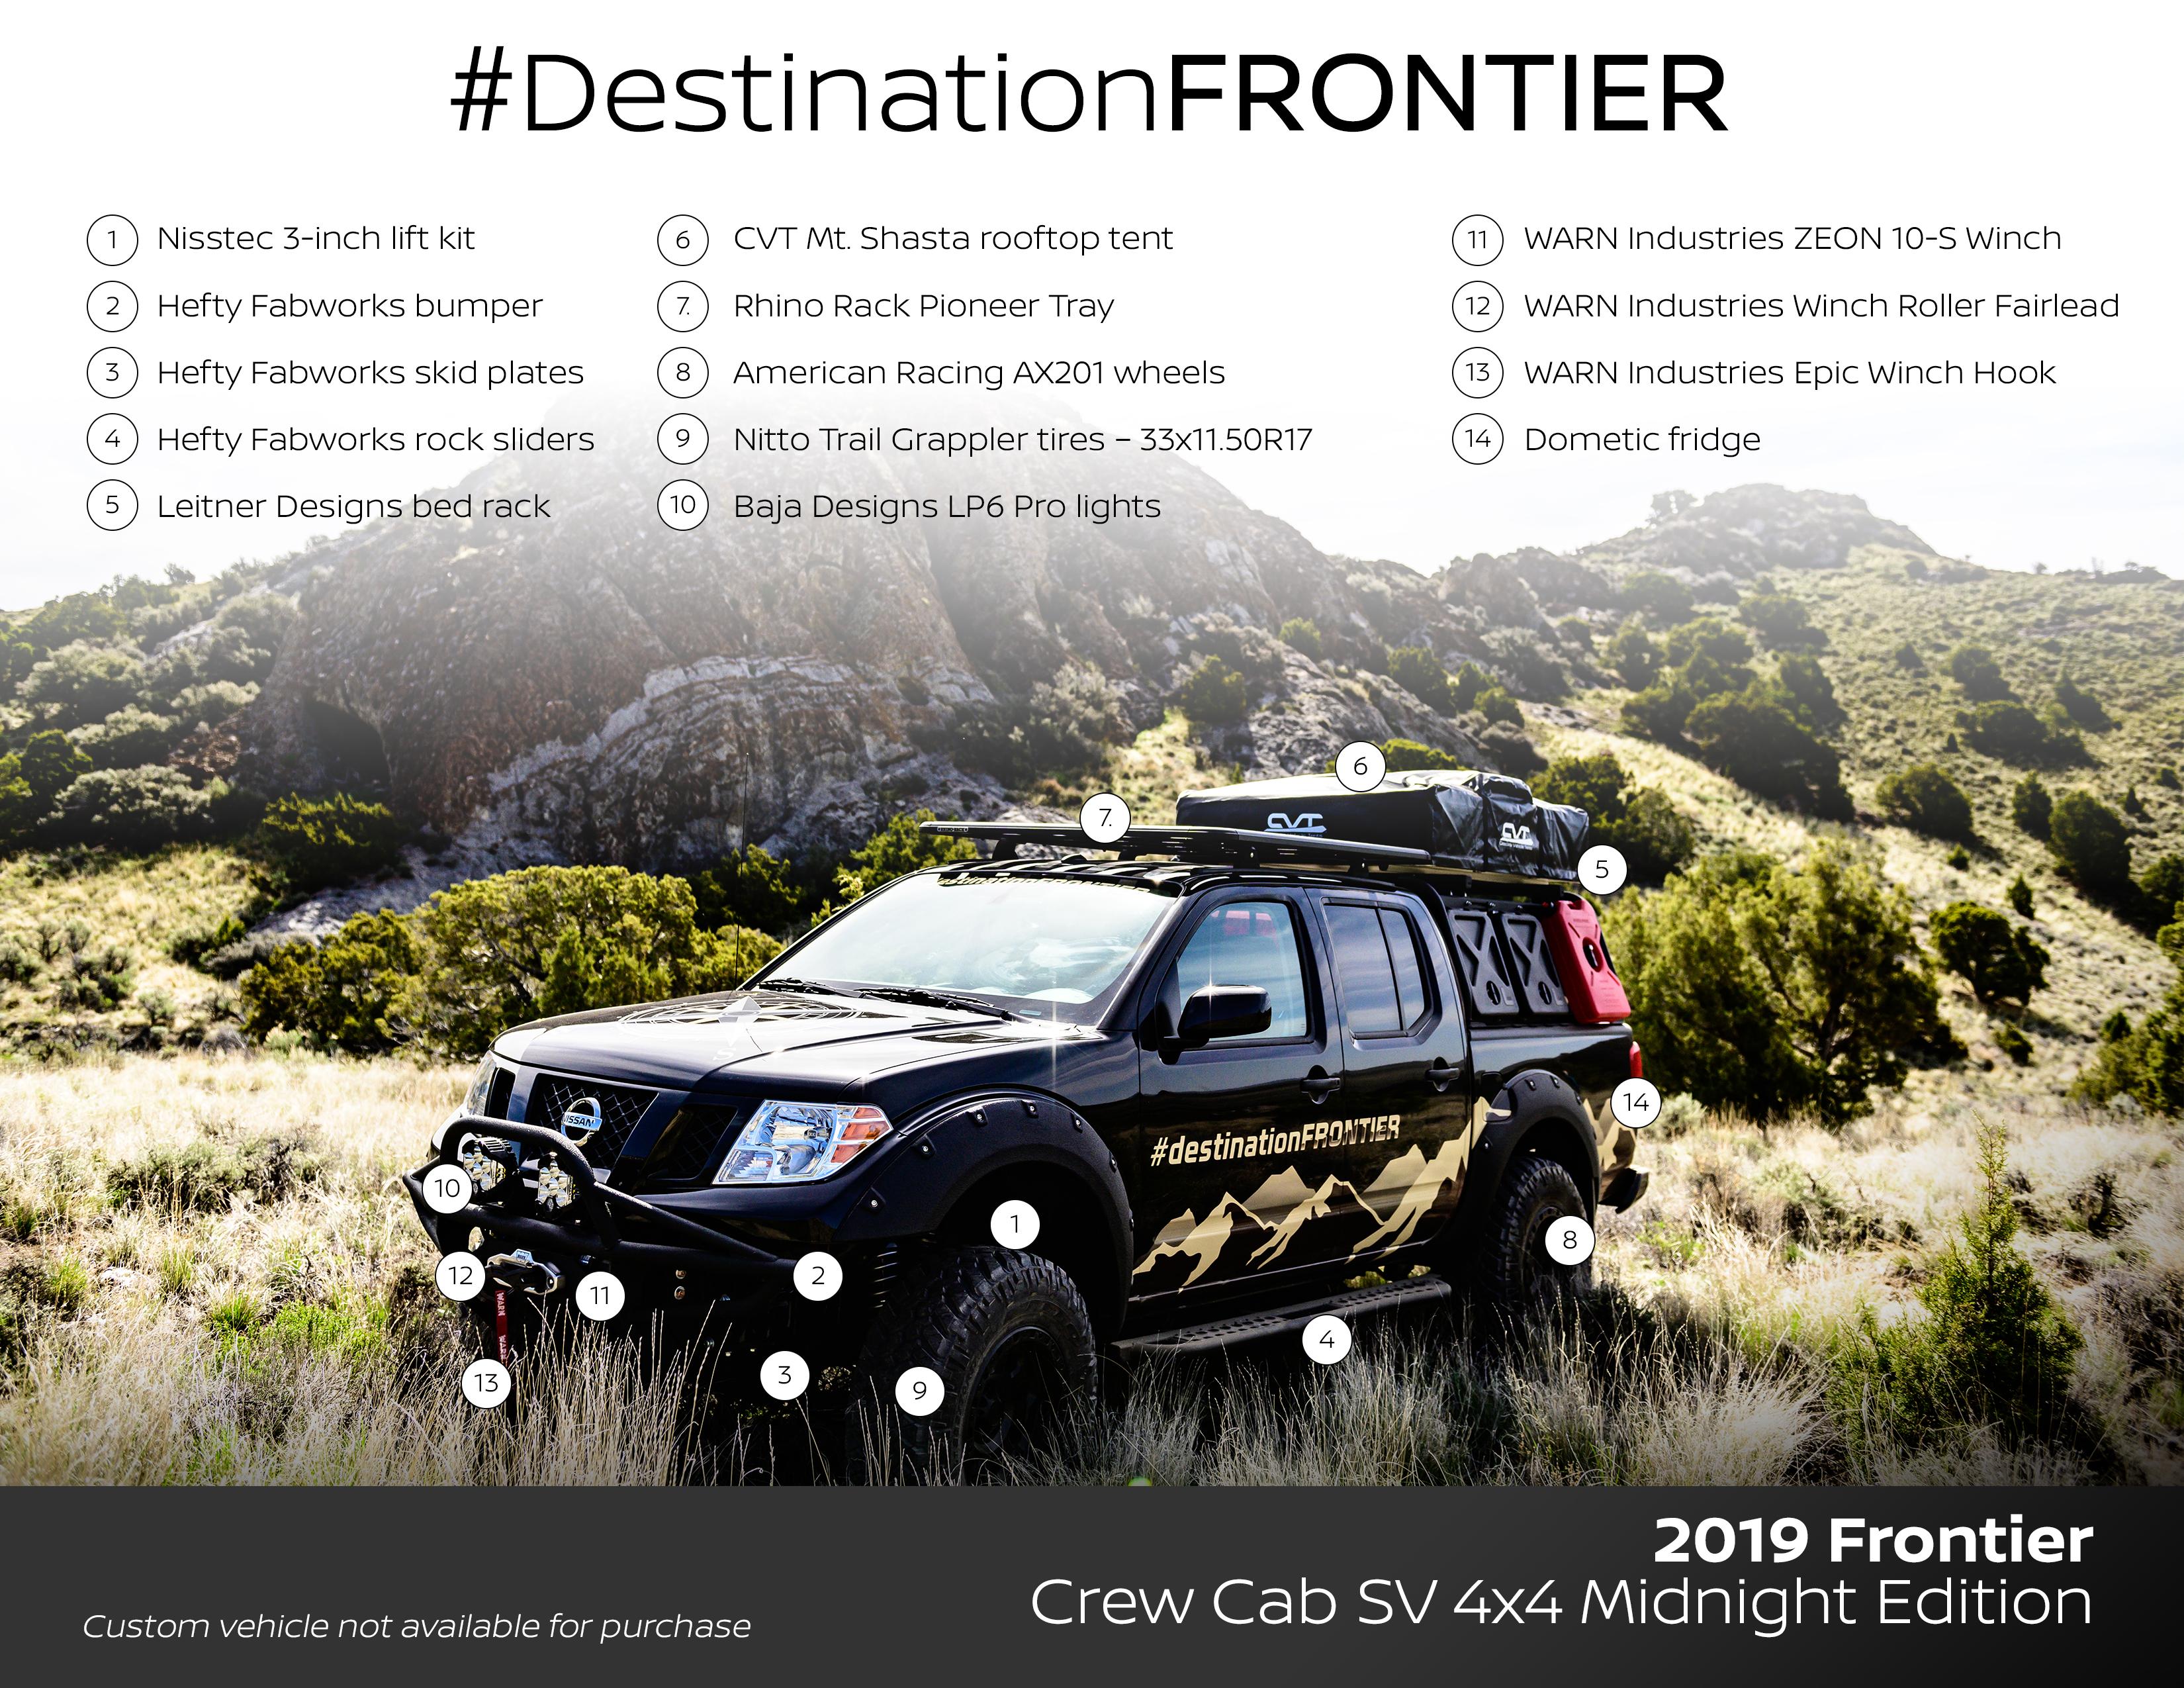 Nissan Destination Frontier full specs